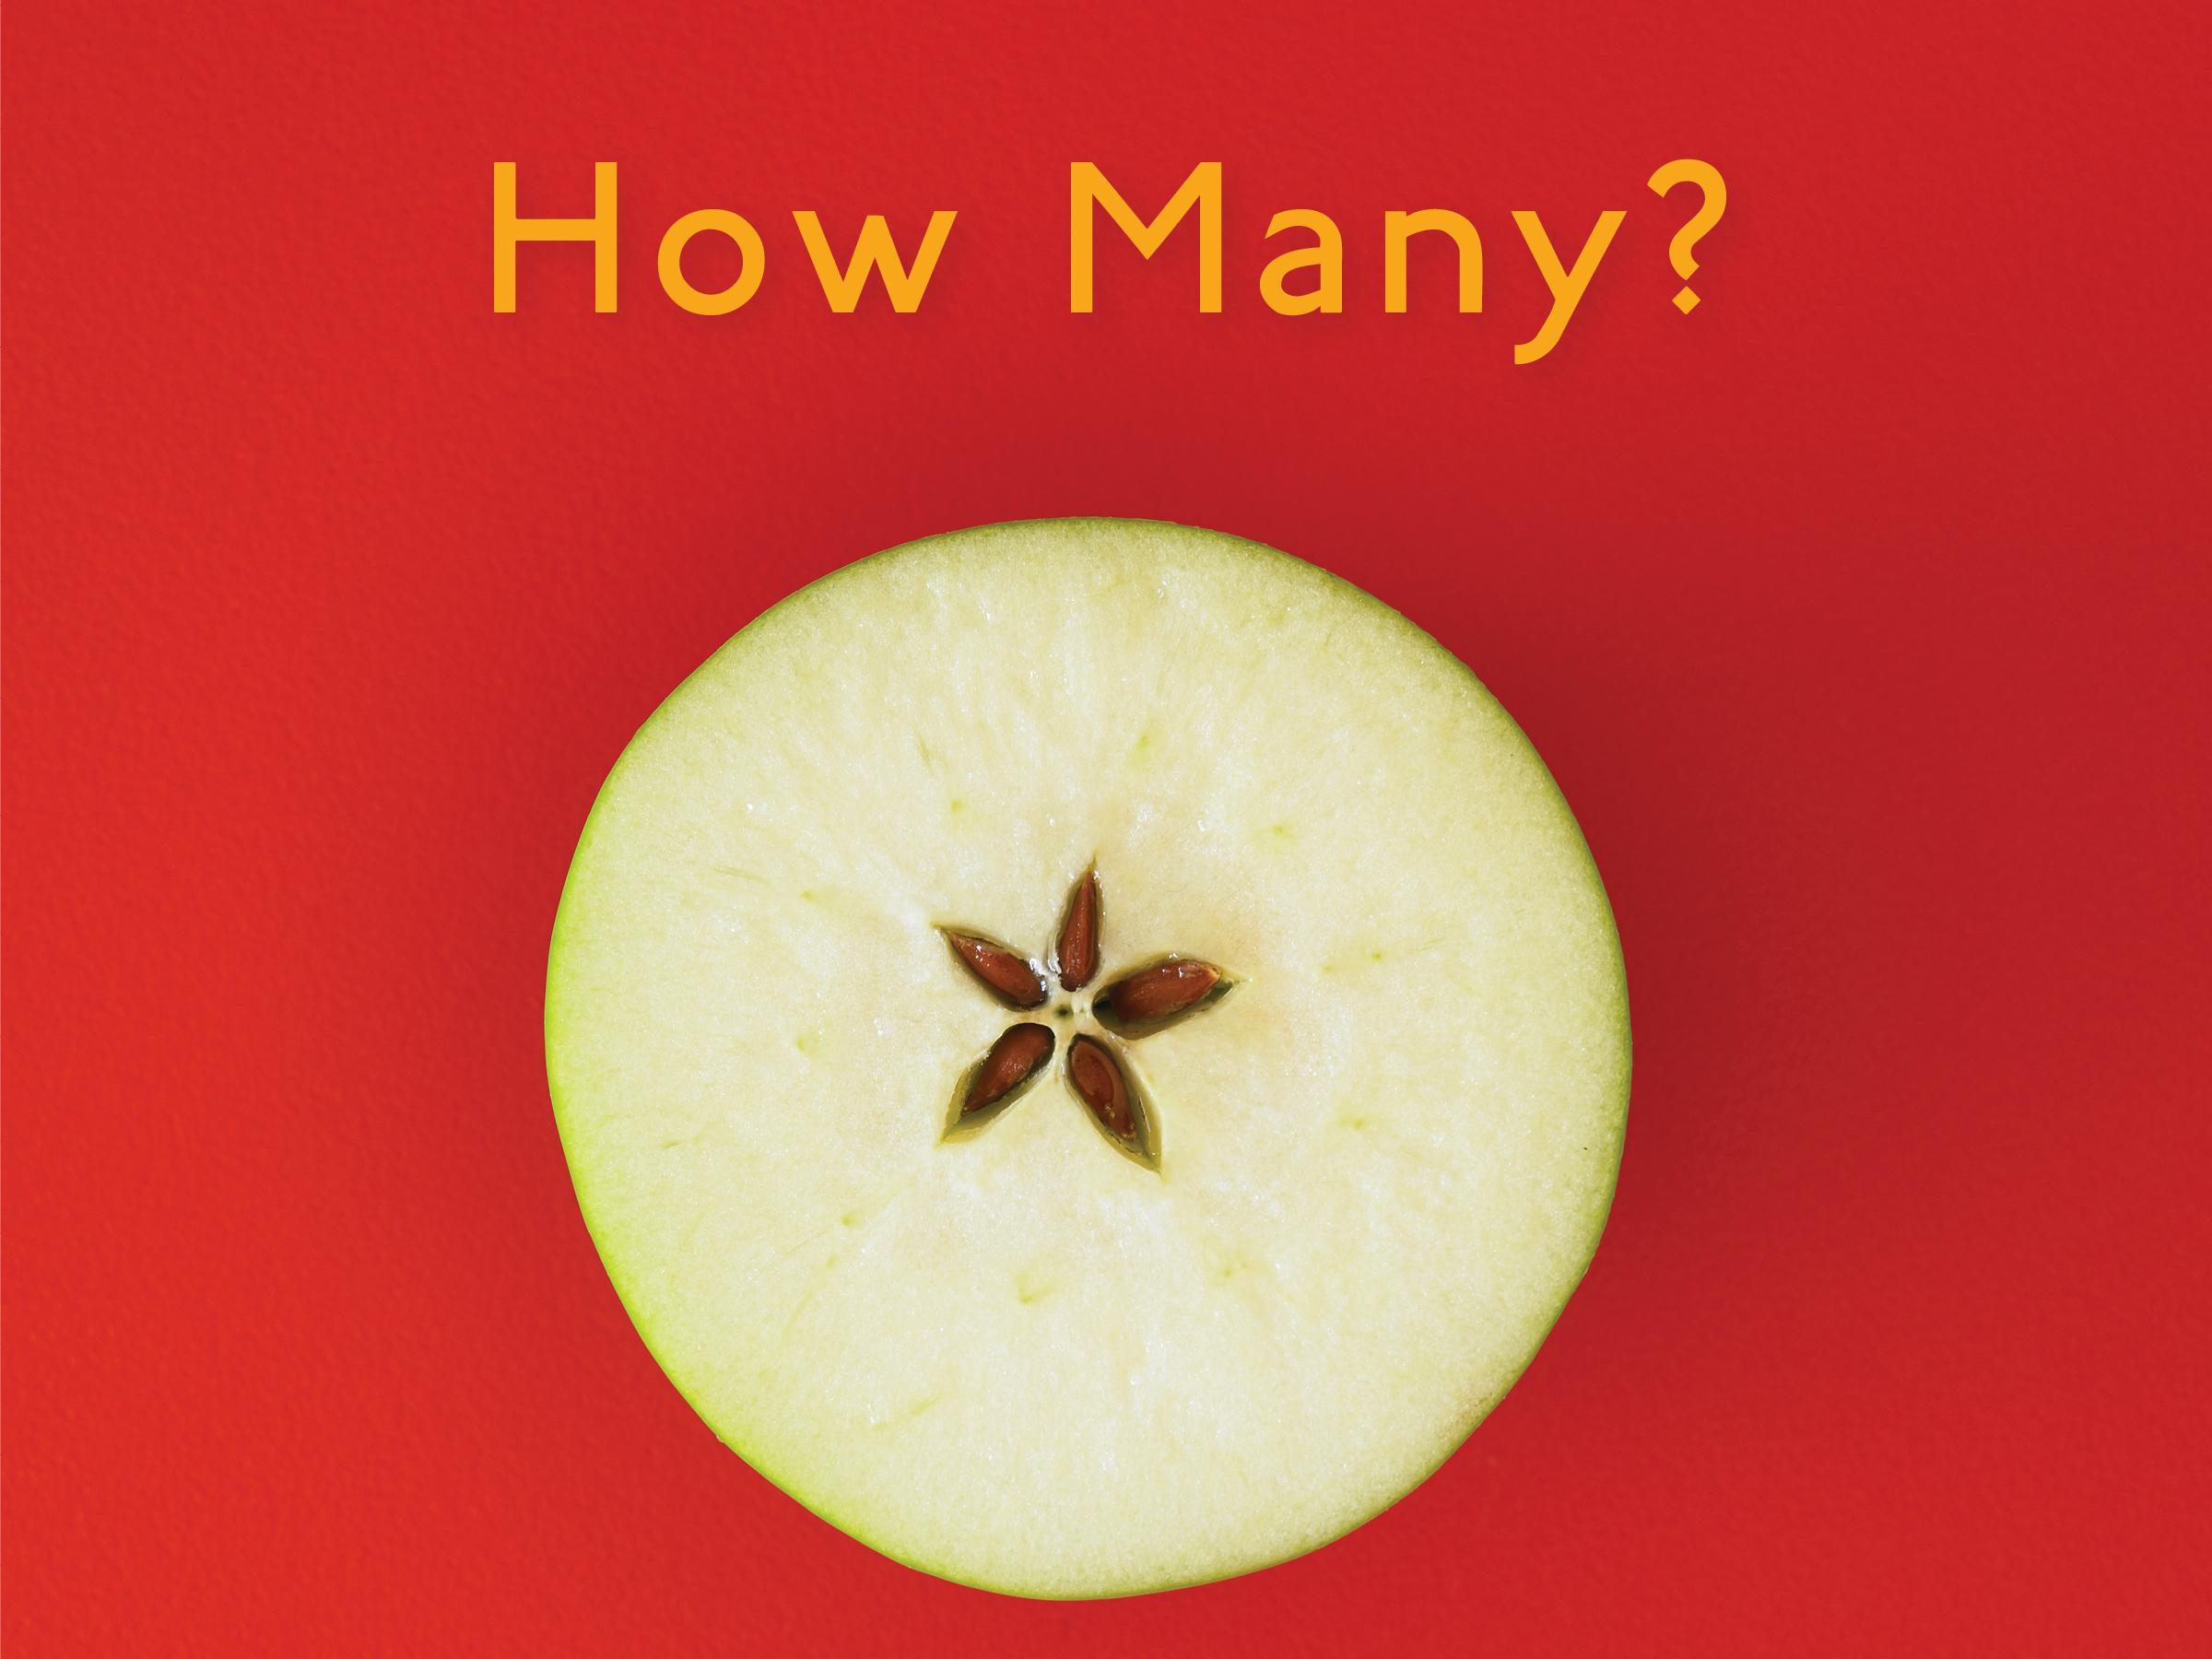 Counting avocados, halves, and grapefruits